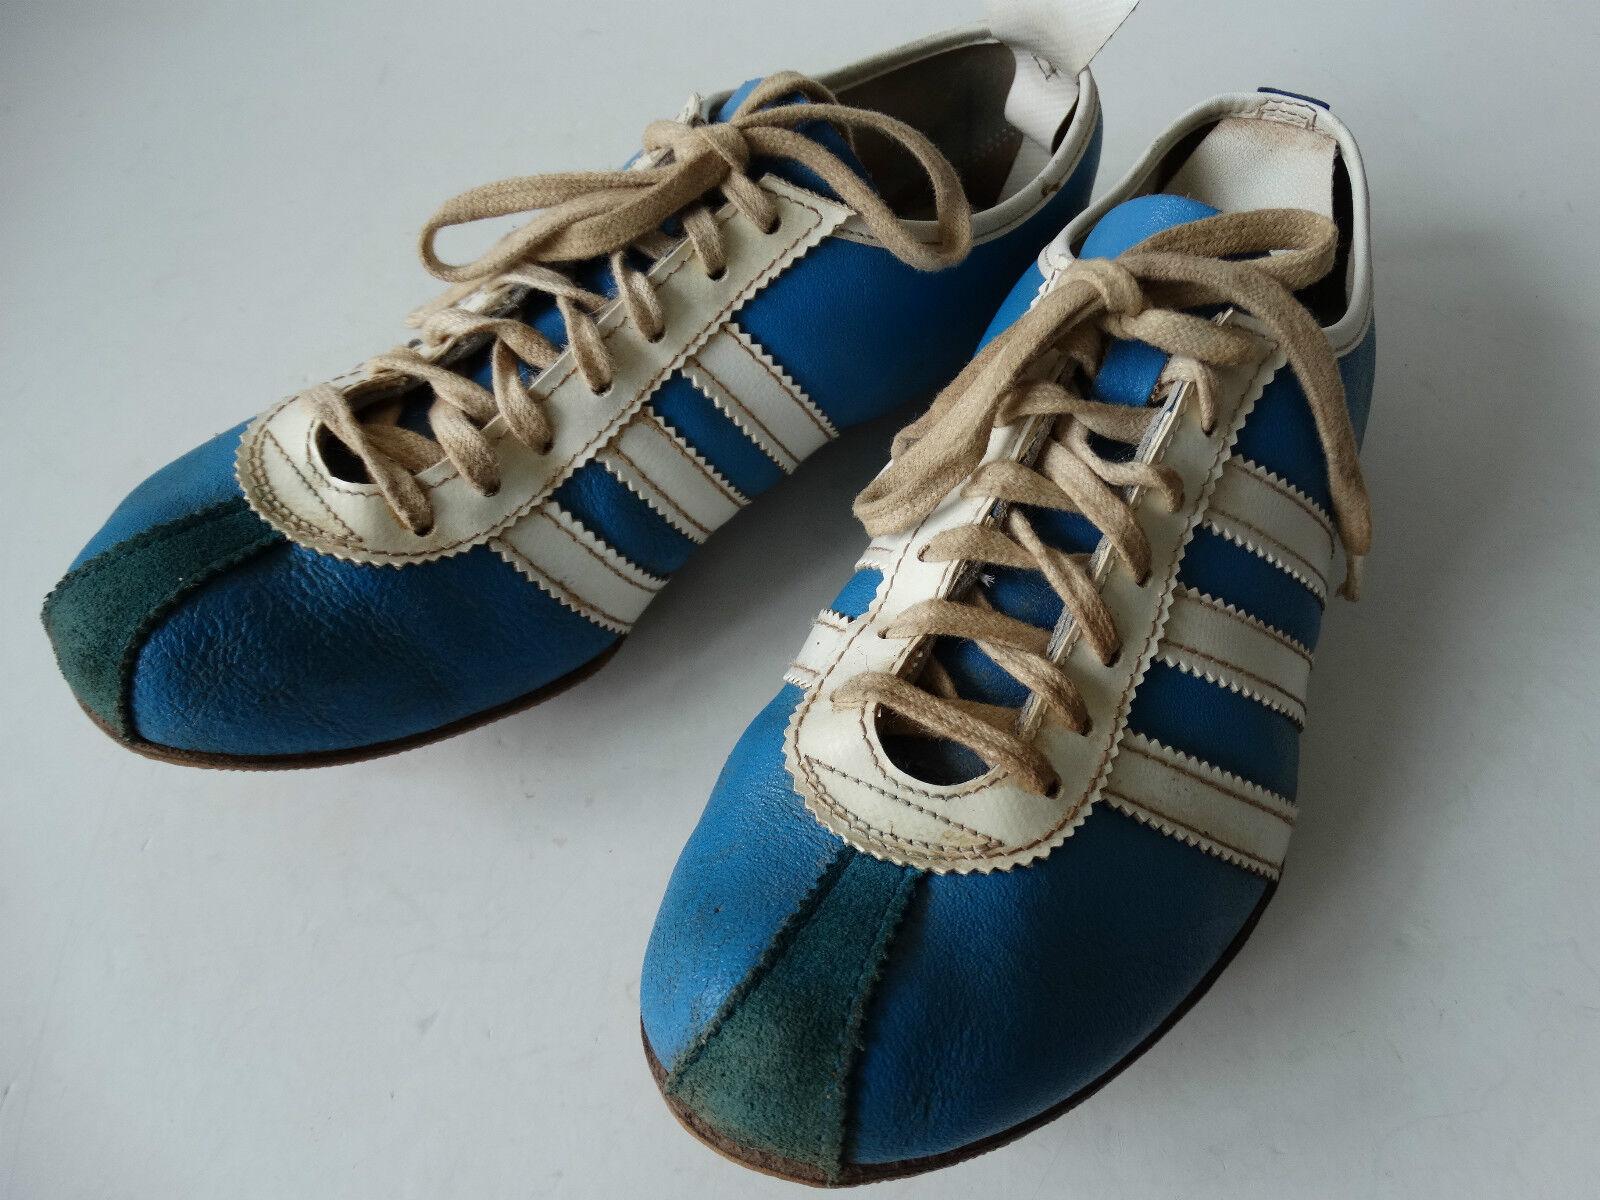 Vintage Adidas SPRINT Spikes Laufschuhe Gr 38(6) Sprinter Sprinter Sprinter Trainers very rare 3e3c36